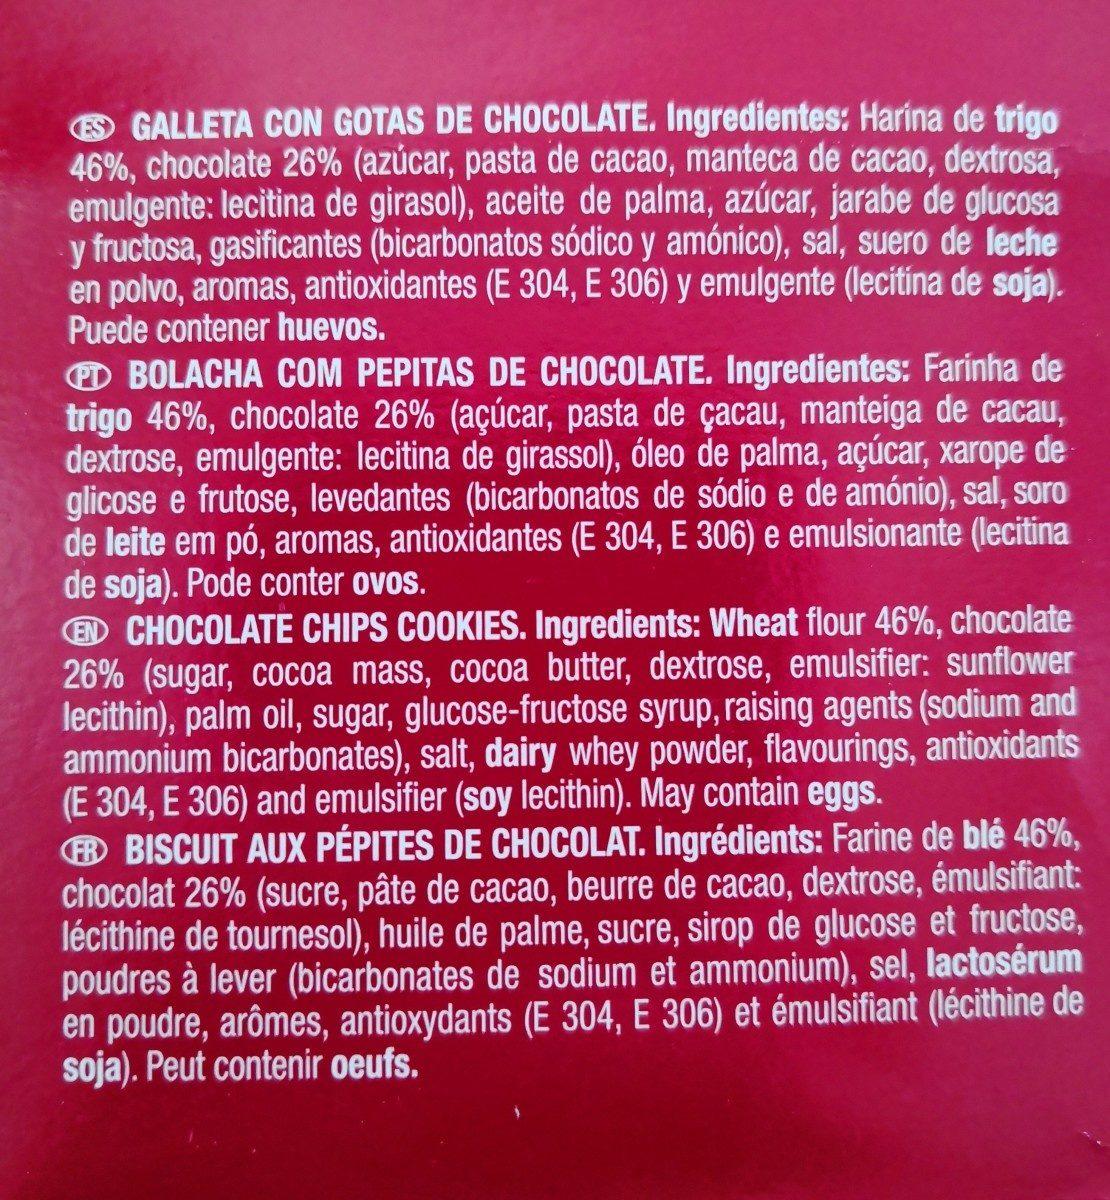 Galetes Chiquilin Chiquichocs - Ingredientes